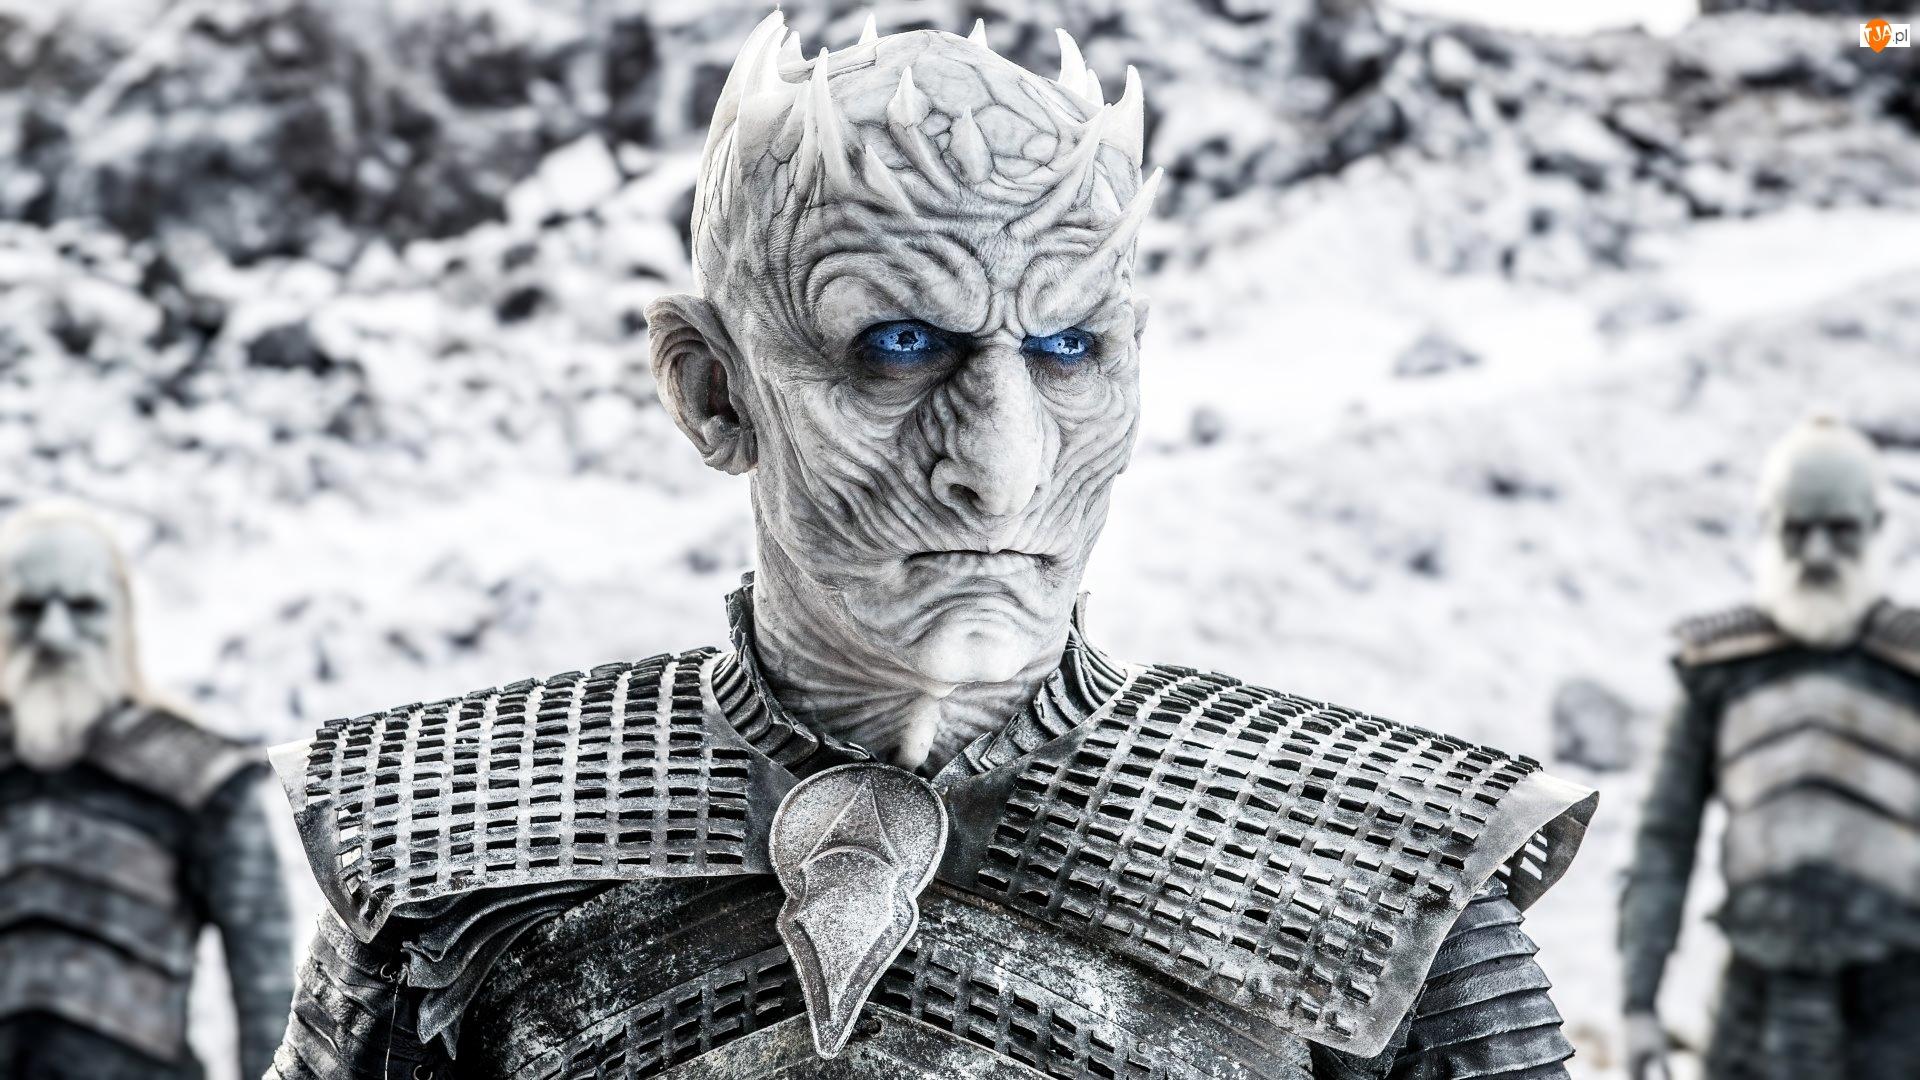 Gra o Tron, Serial, Nocny Król, Innych, Game of Thrones, Dowódca